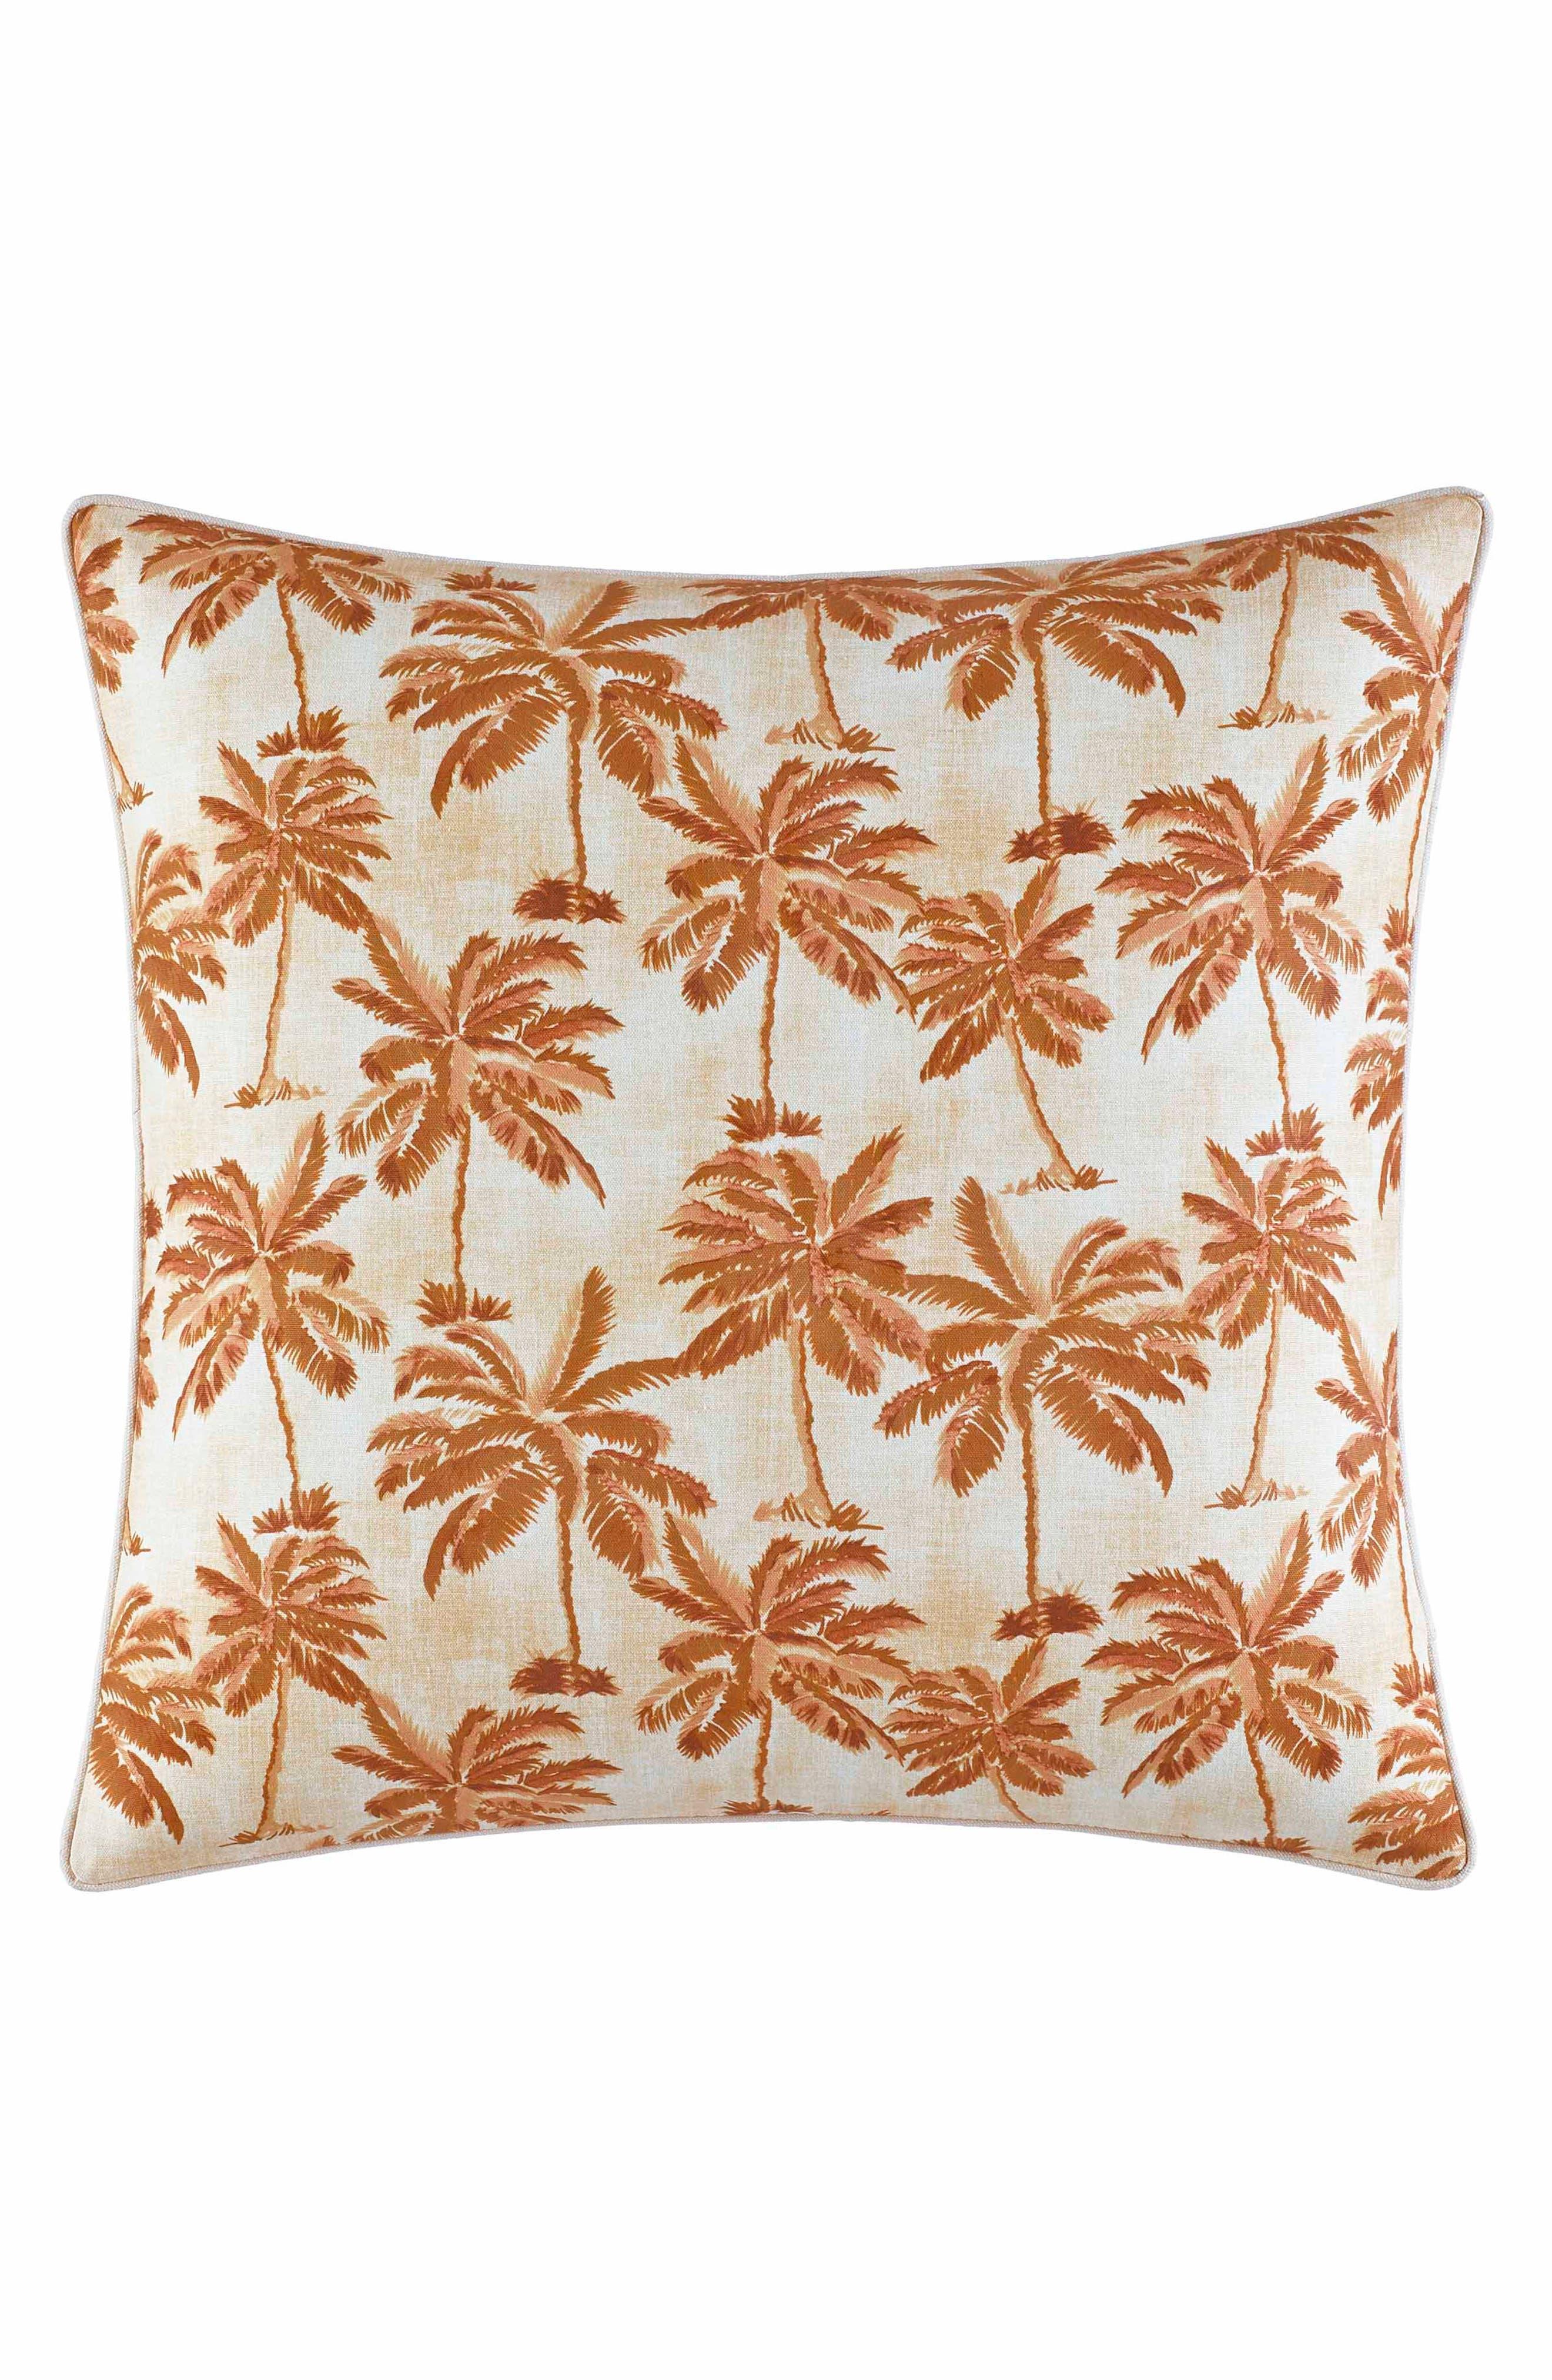 Kamari Print Accent Pillow,                             Main thumbnail 1, color,                             Medium Orange